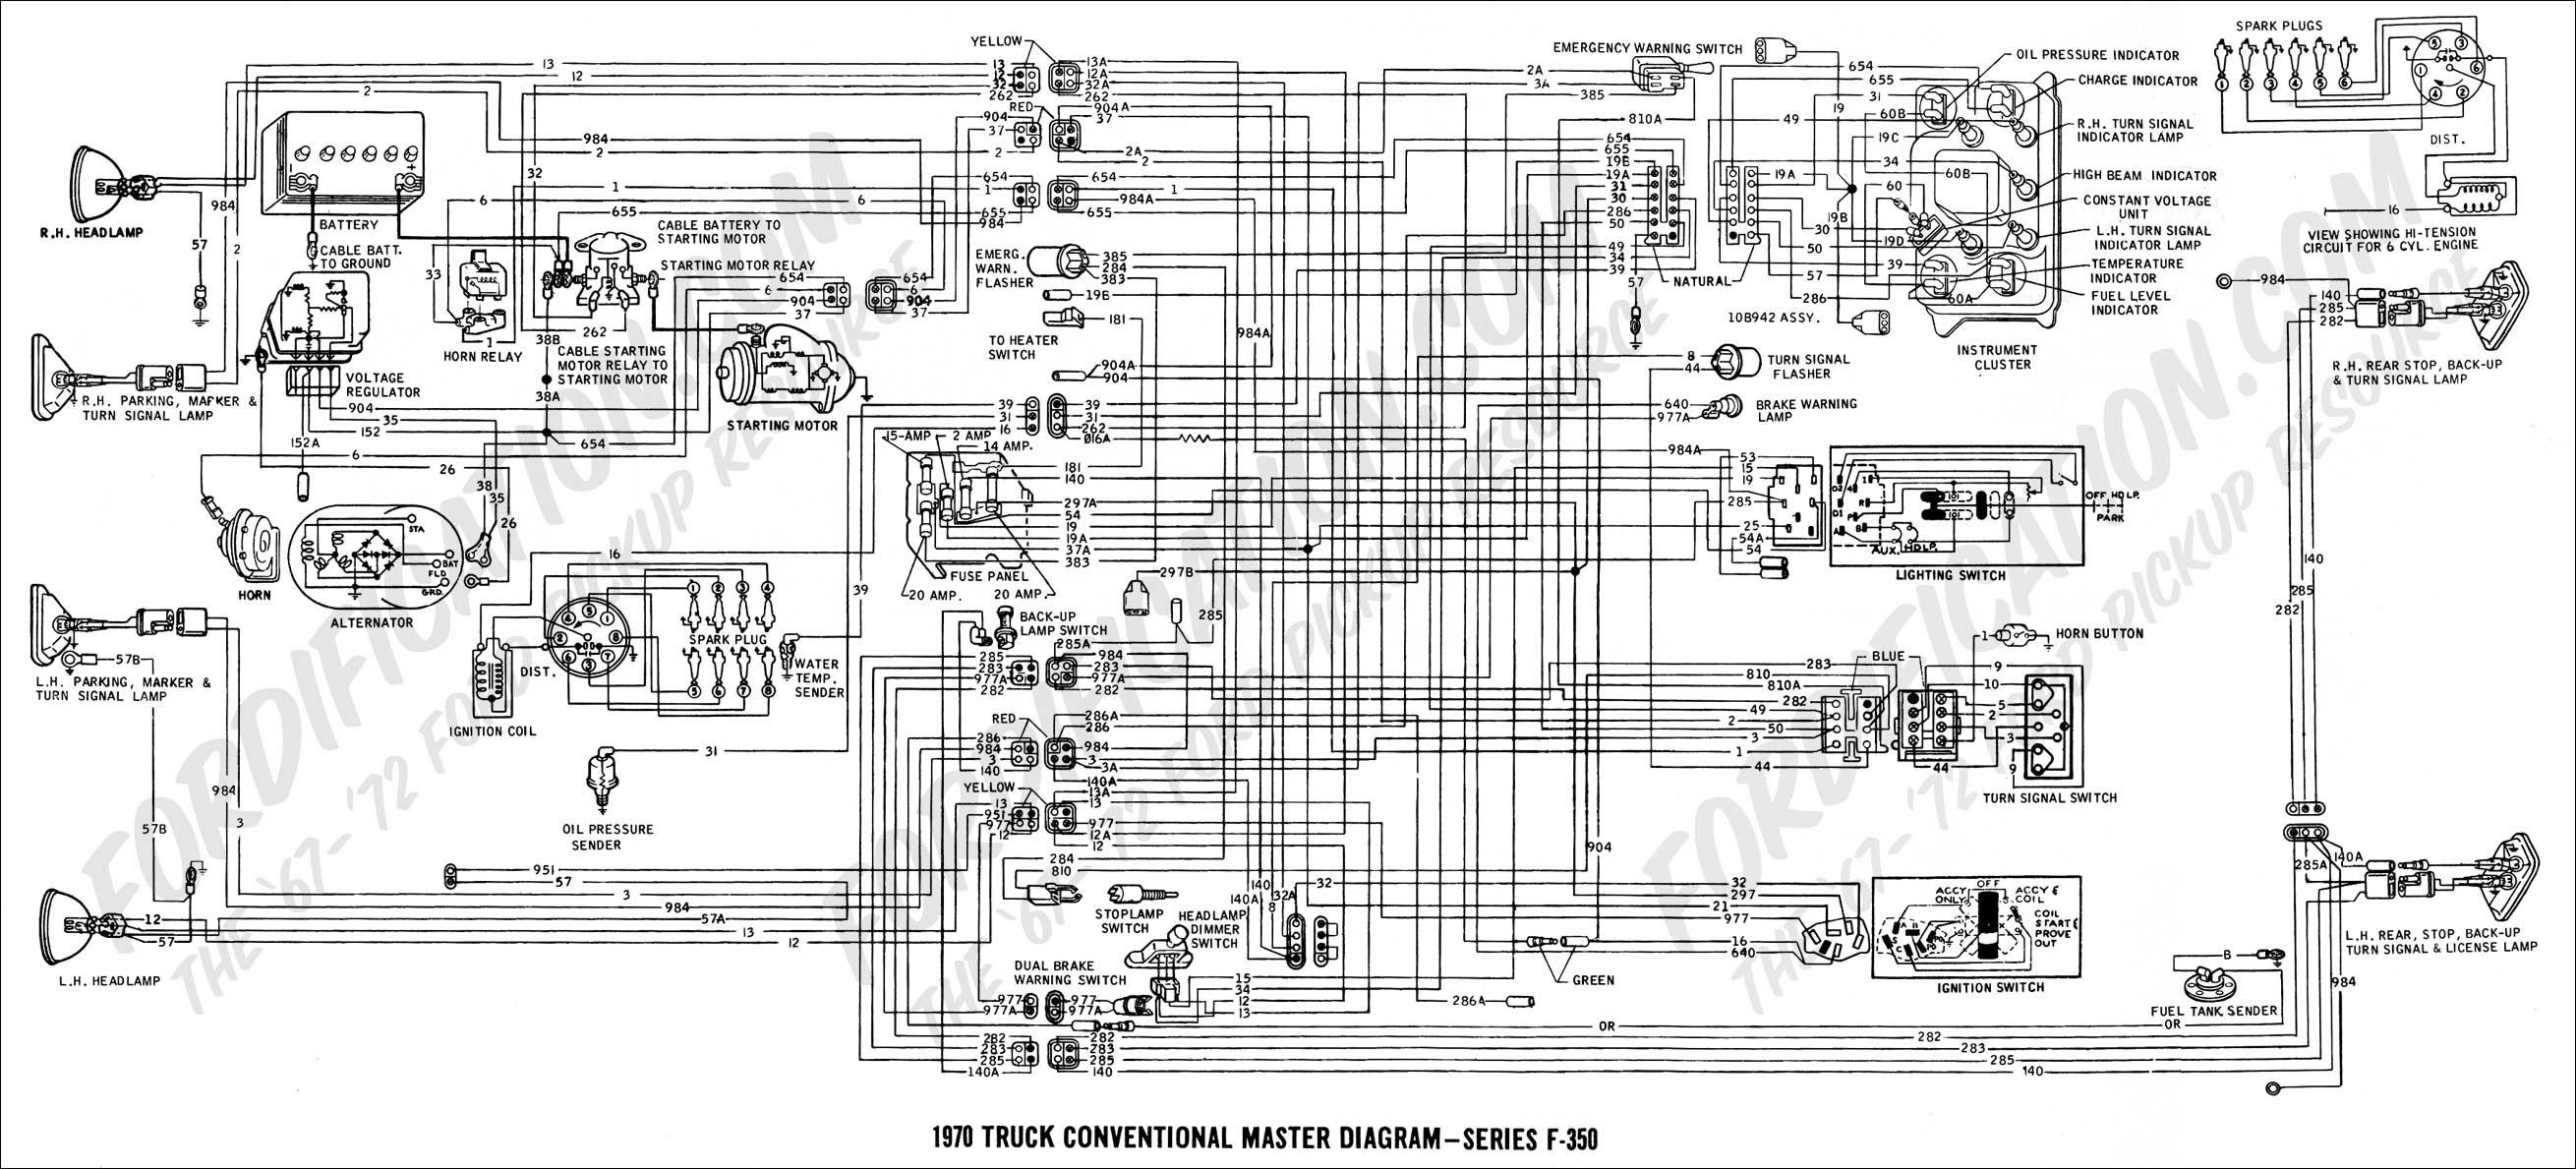 Polaris Ranger Engine Diagram Polaris Predator 500 Wiring Diagram 03 ...